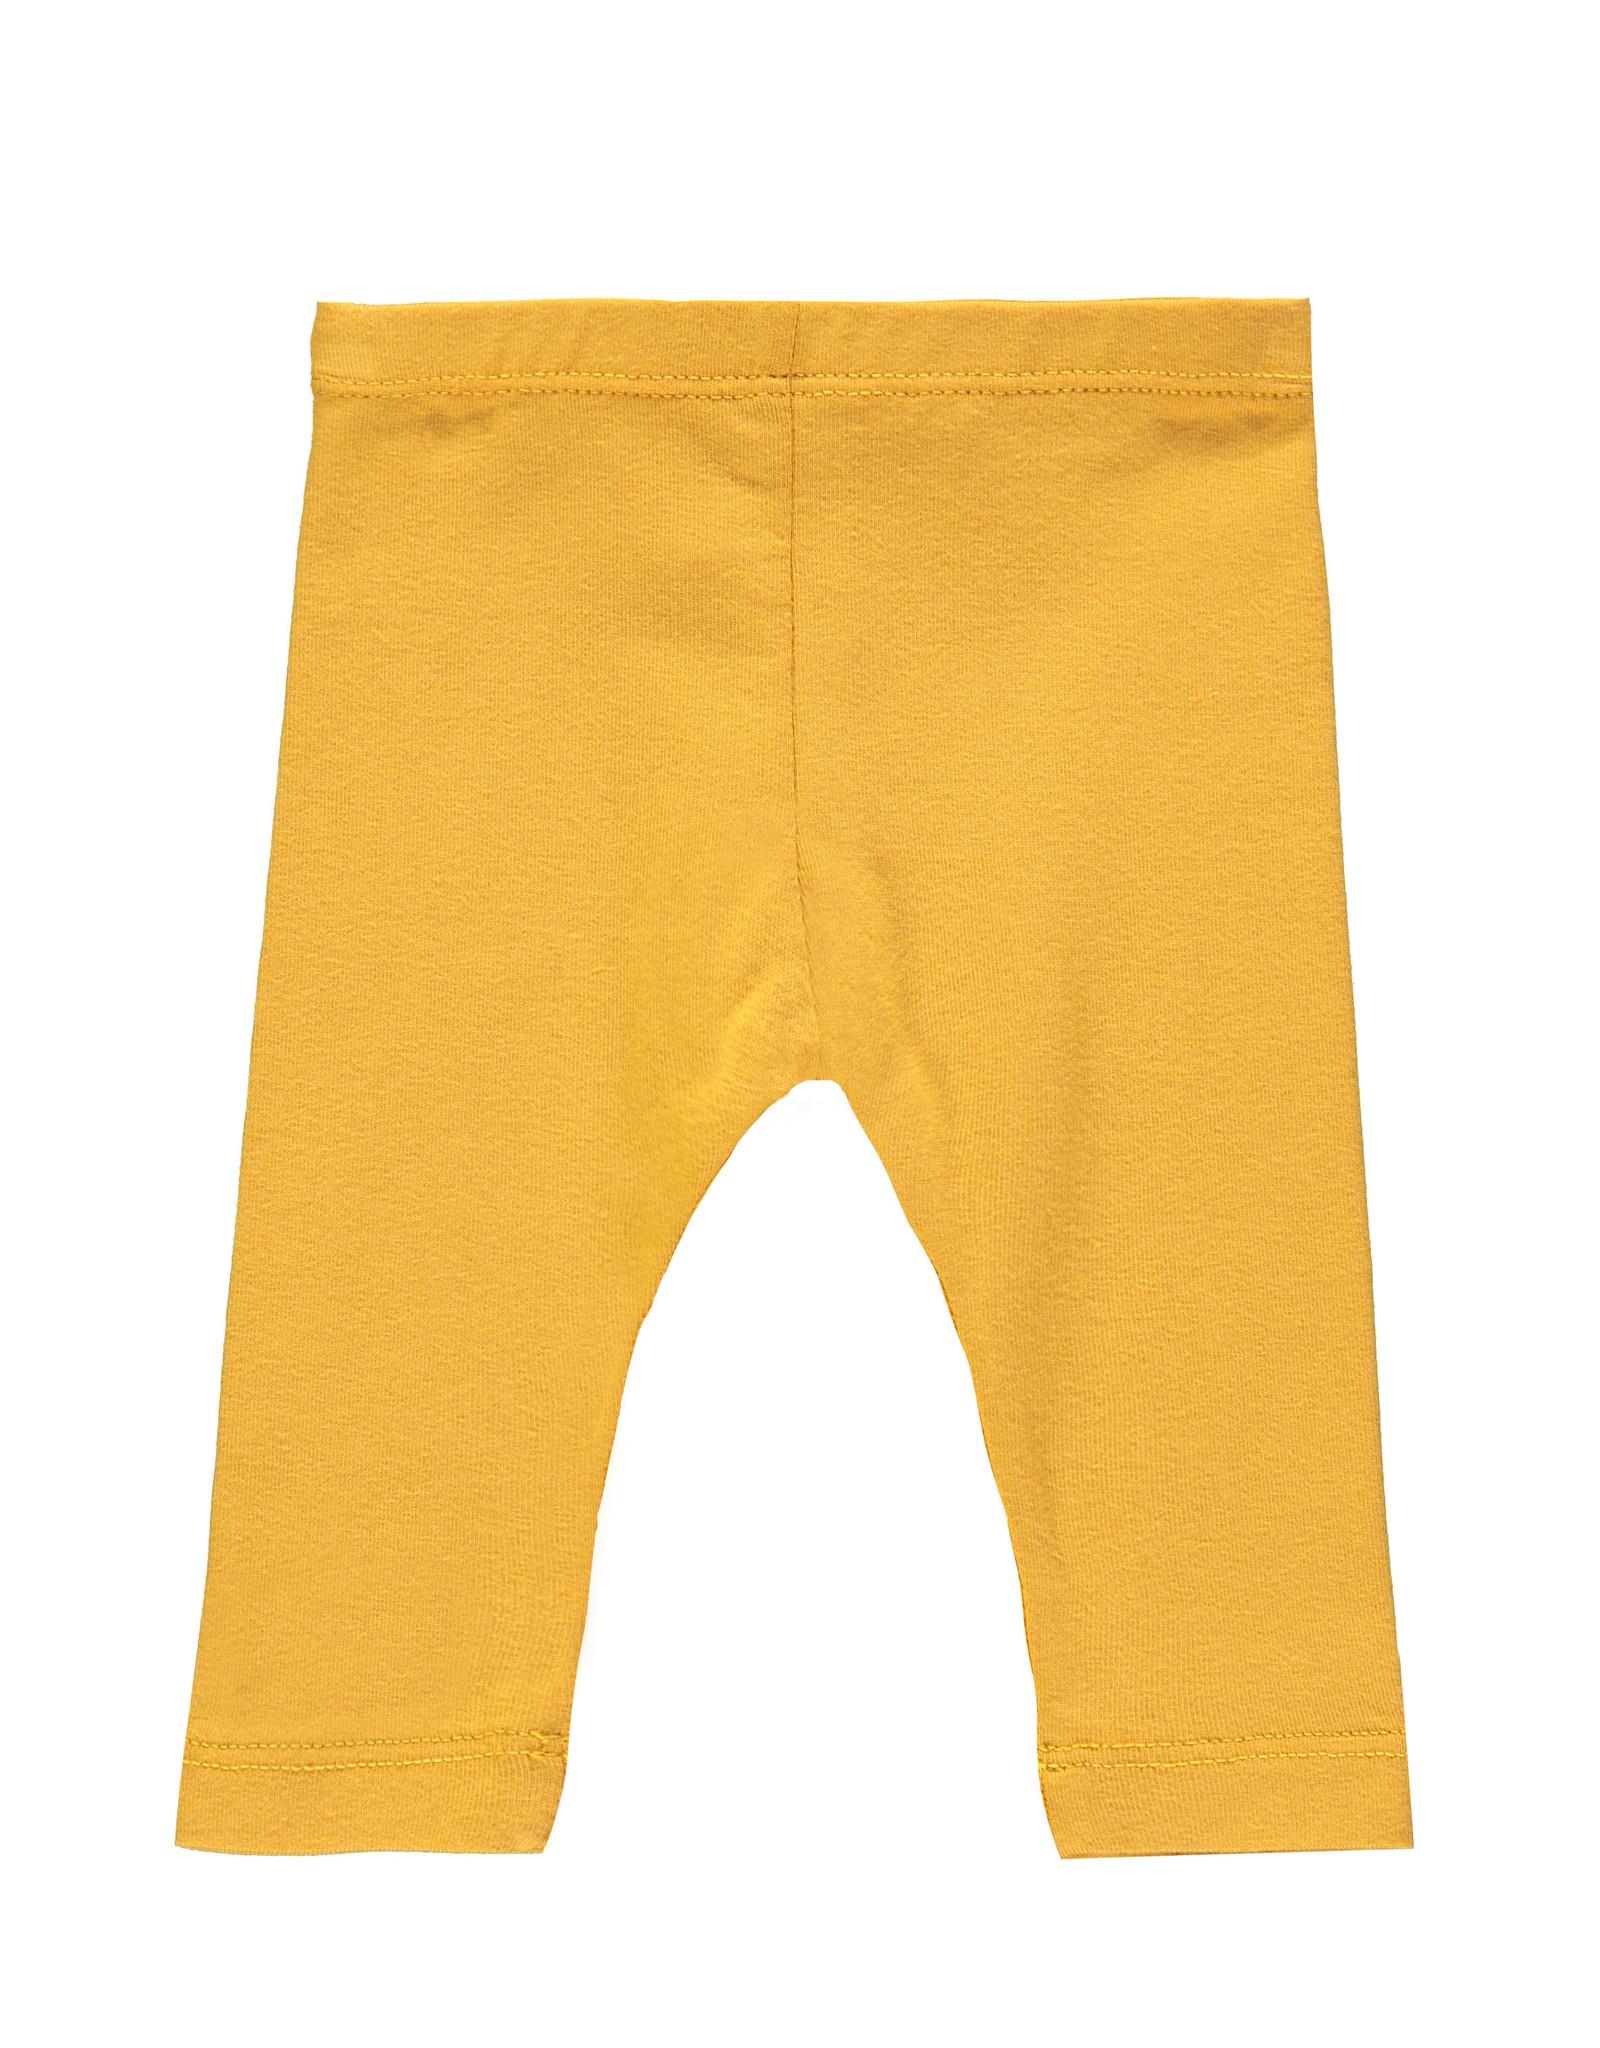 Bampidano Little Bampidano New Born legging Billie FREE HUGS, ocre yellow